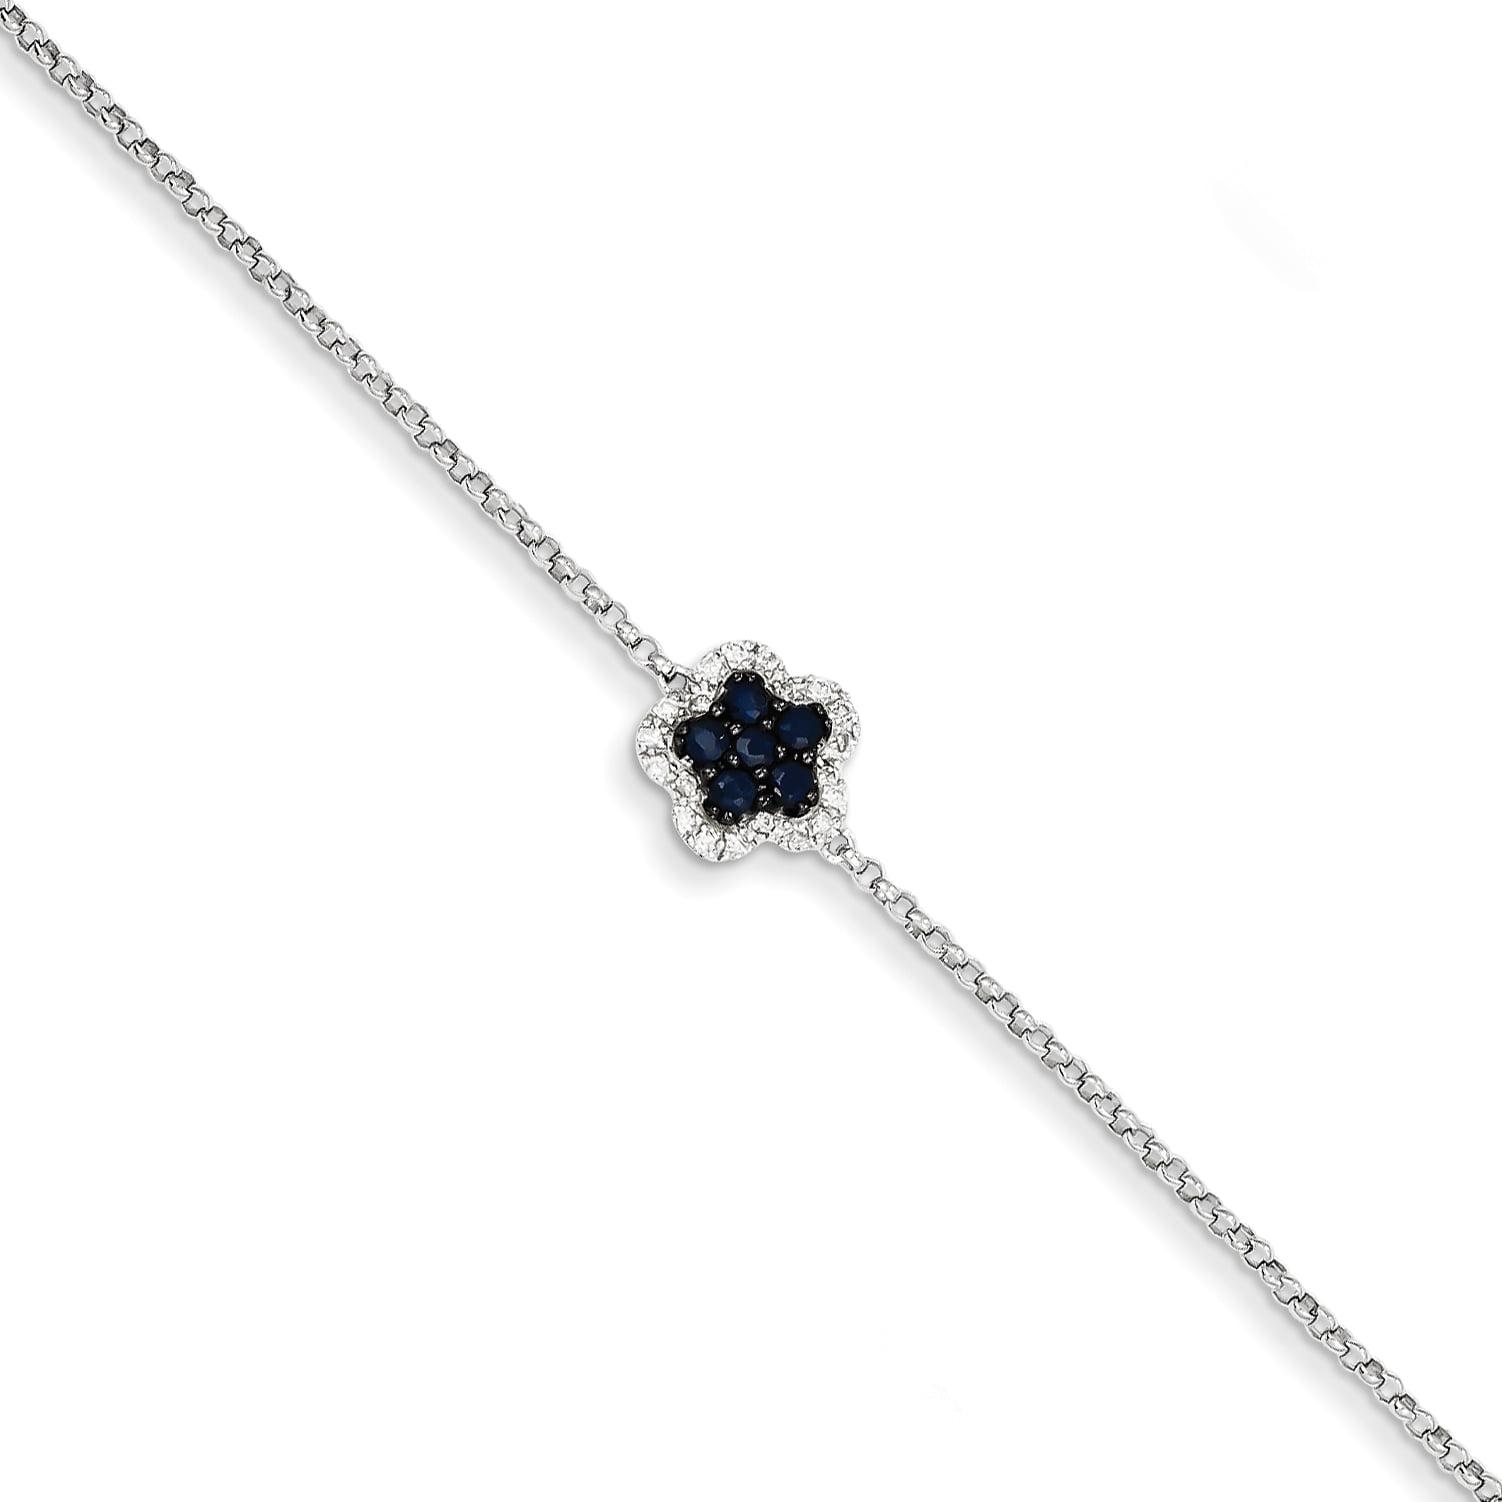 14k White Gold White Diamond & Sapphire Flower w  .5in Ext. Bracelet by